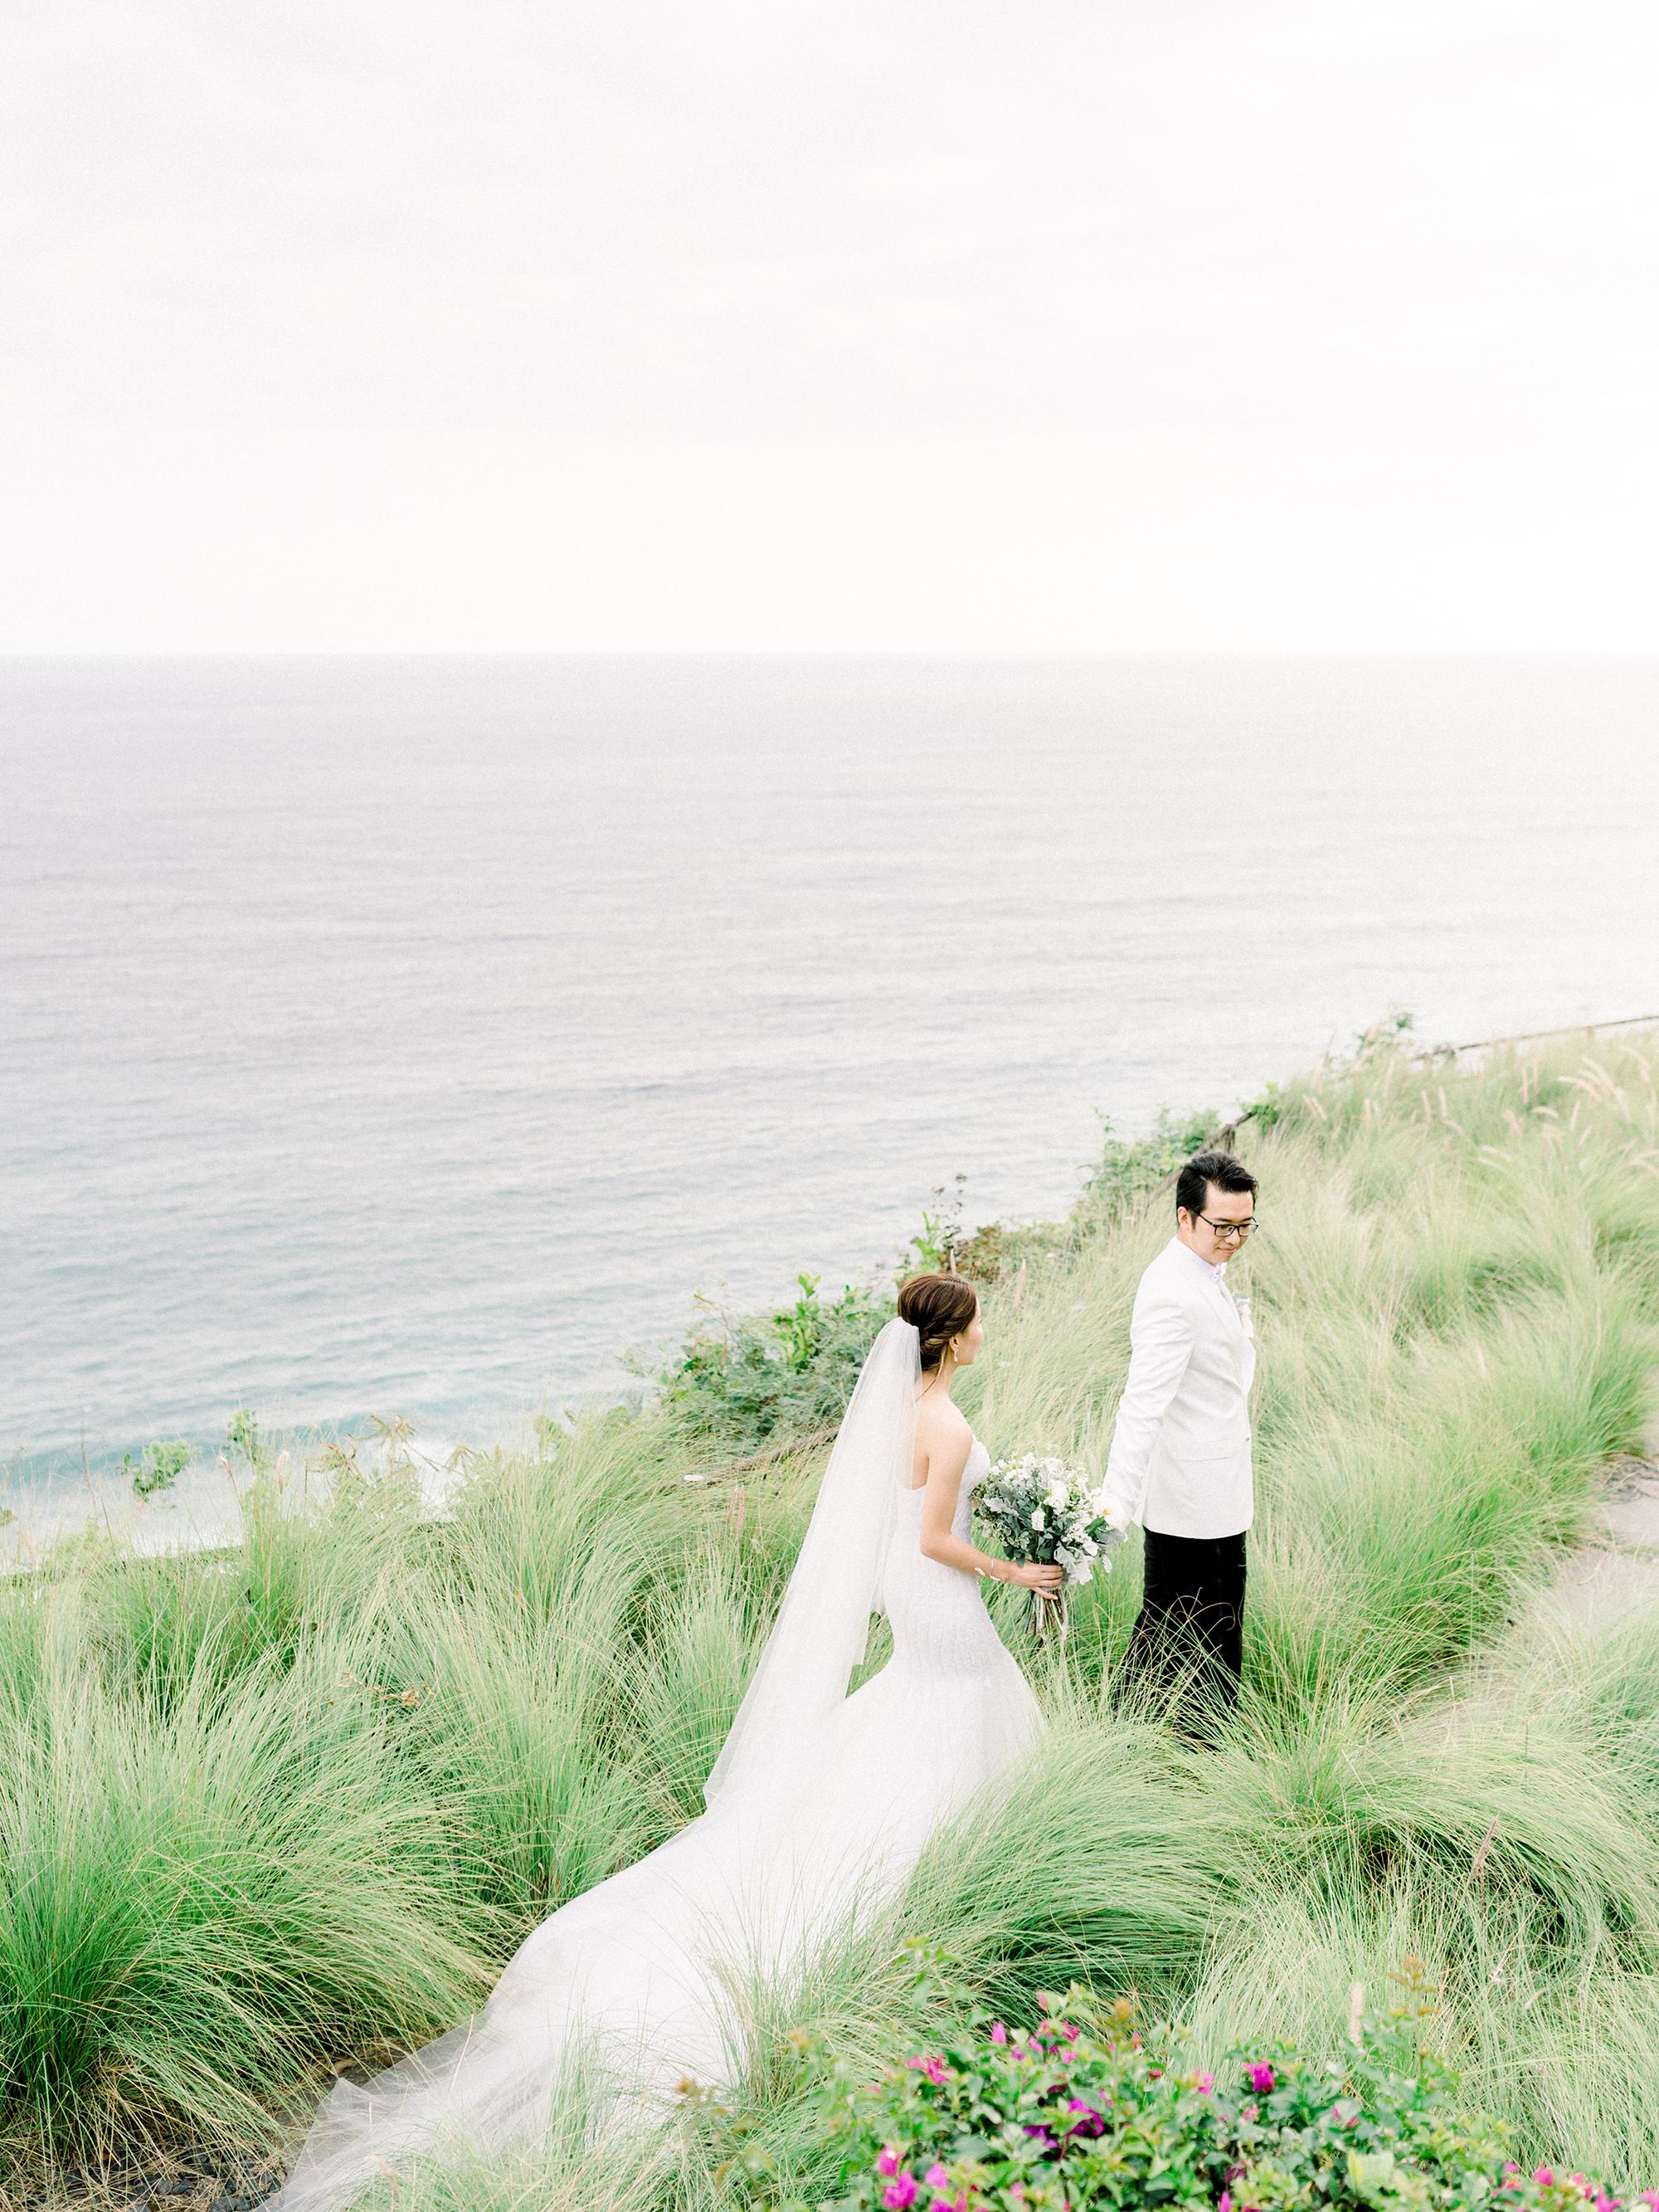 couple walking overlooking beach